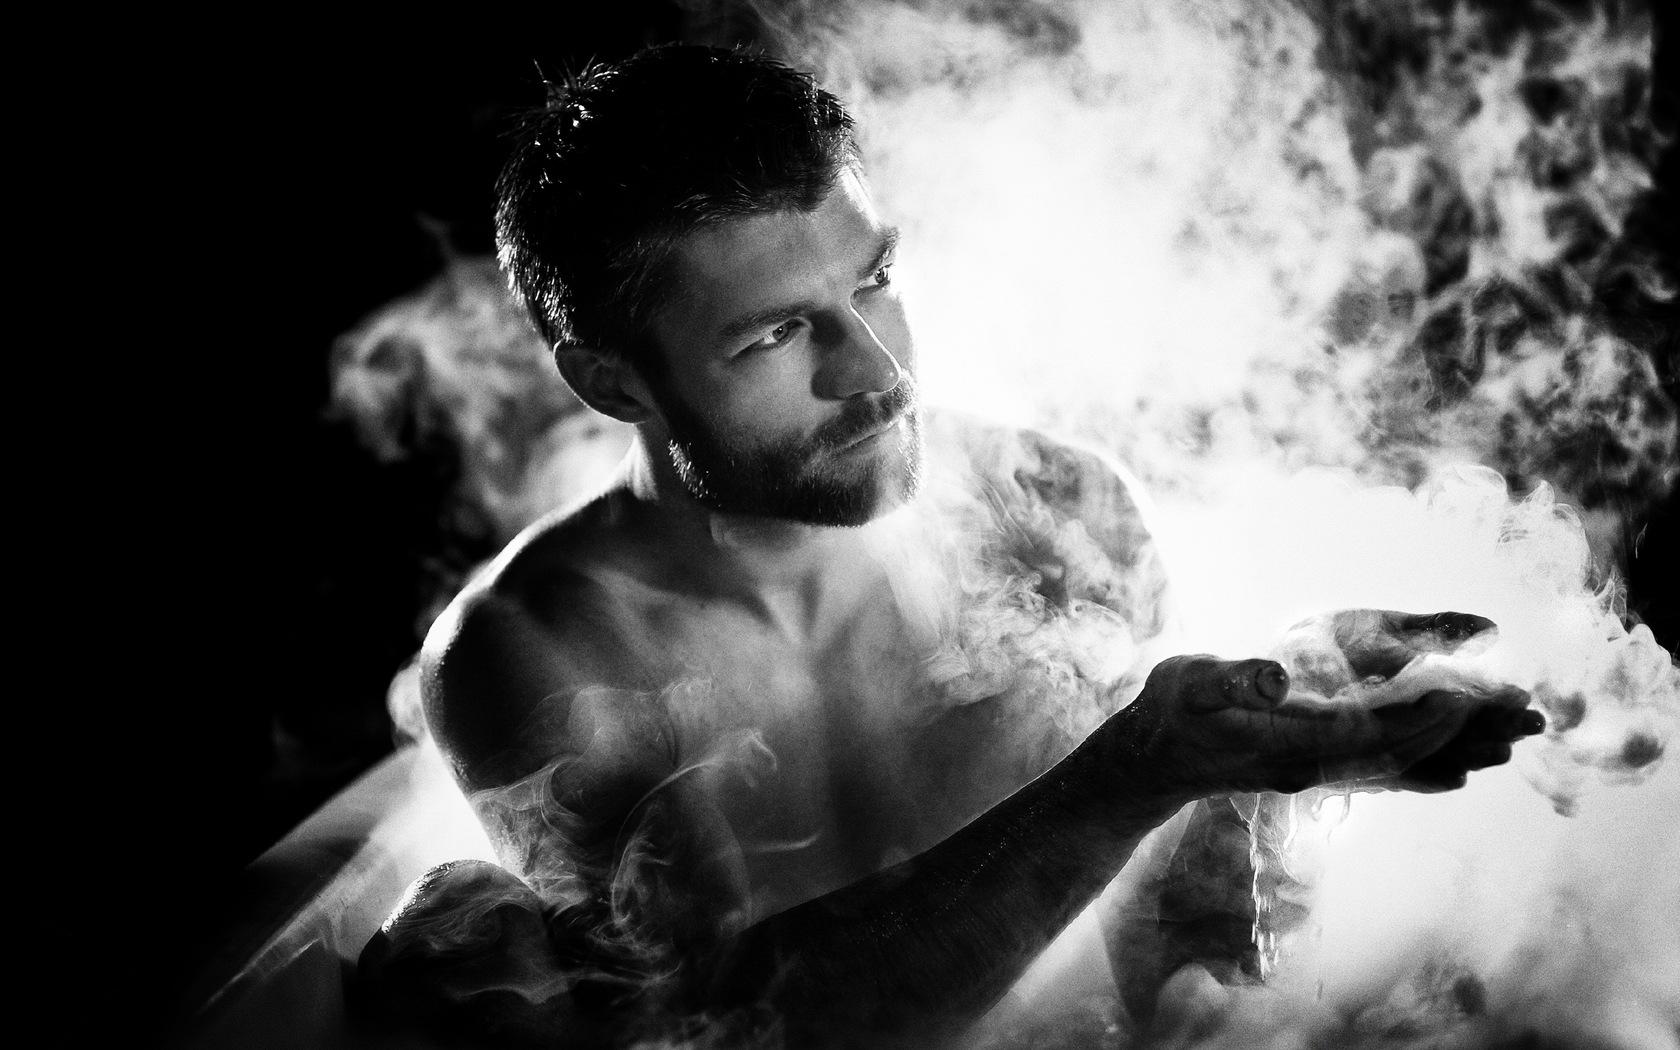 White Black Monochrome Photography Smoke Man Darkness And Film Noir